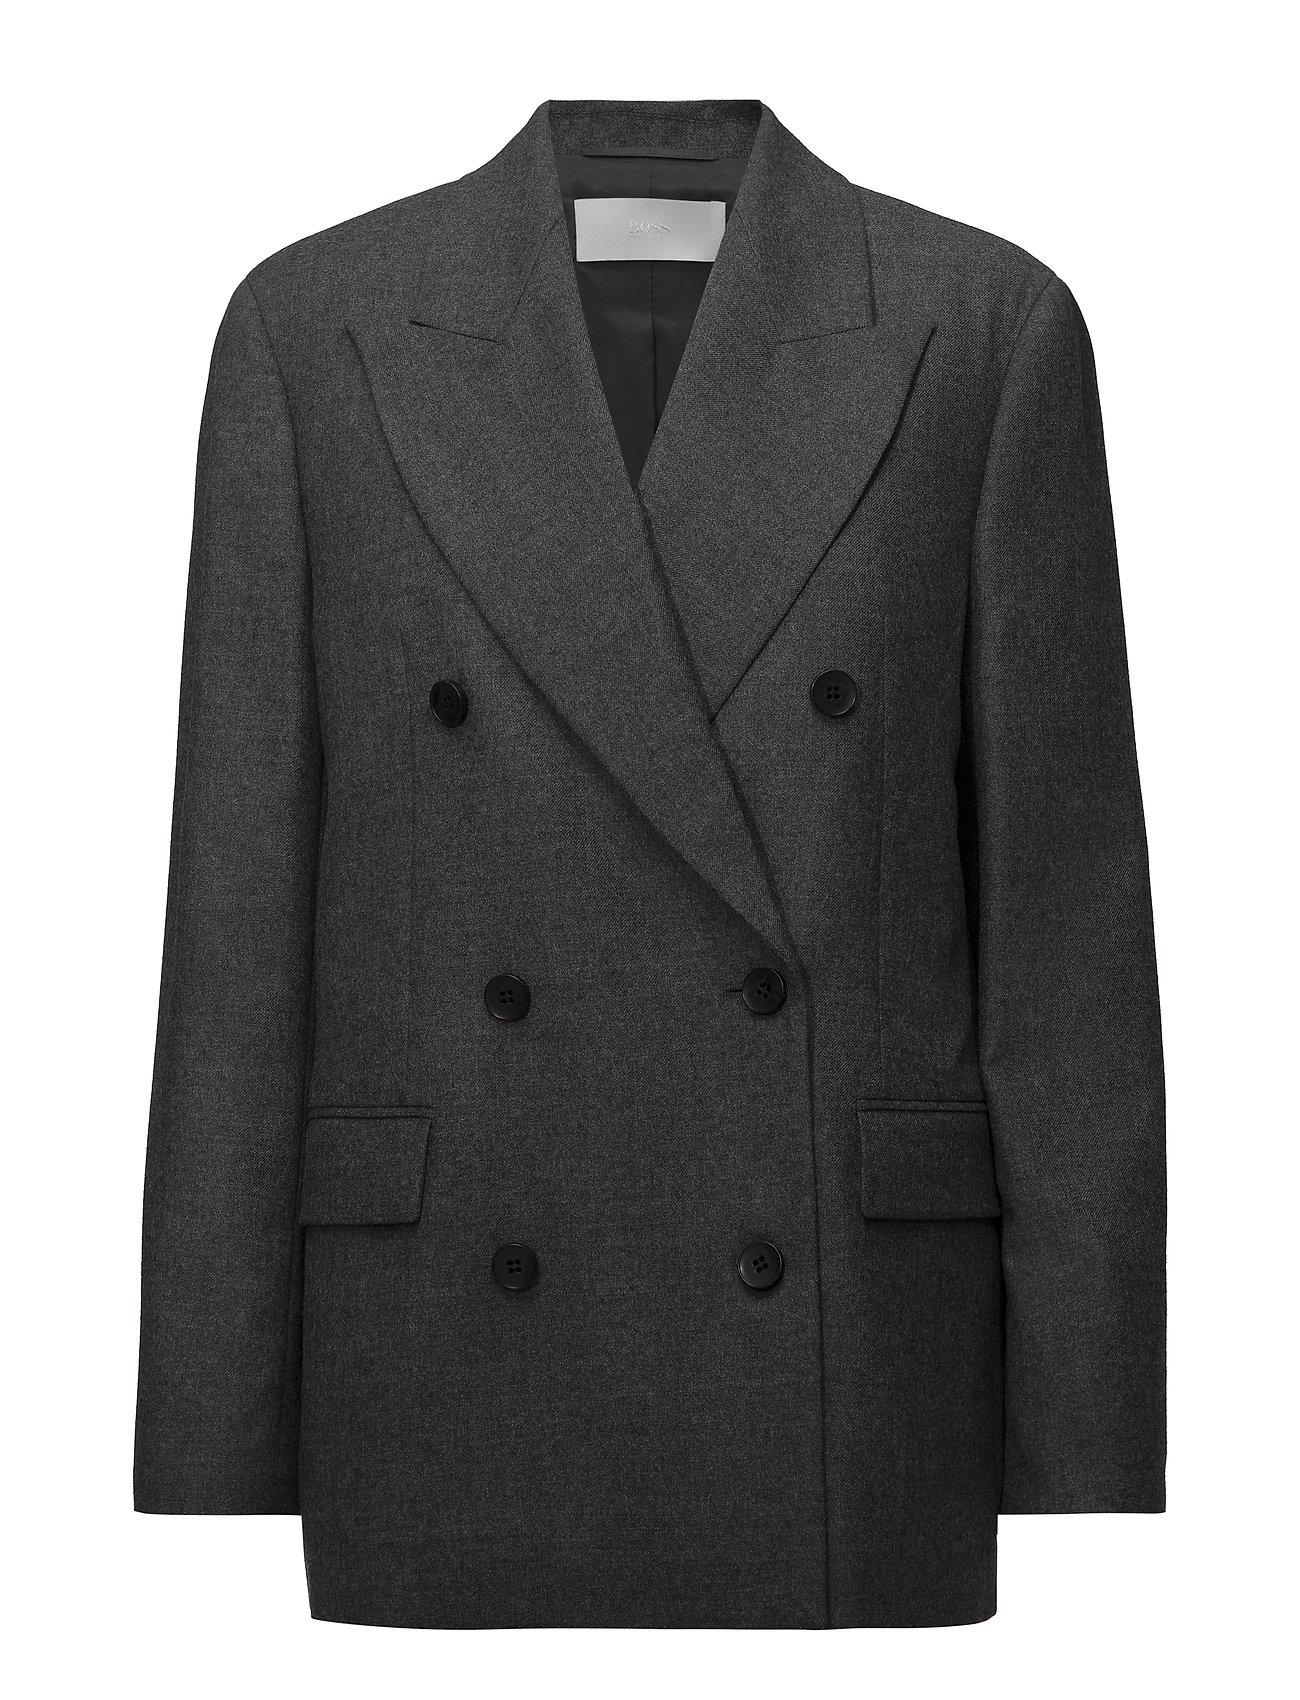 BOSS Business Wear Jerimana - CHARCOAL